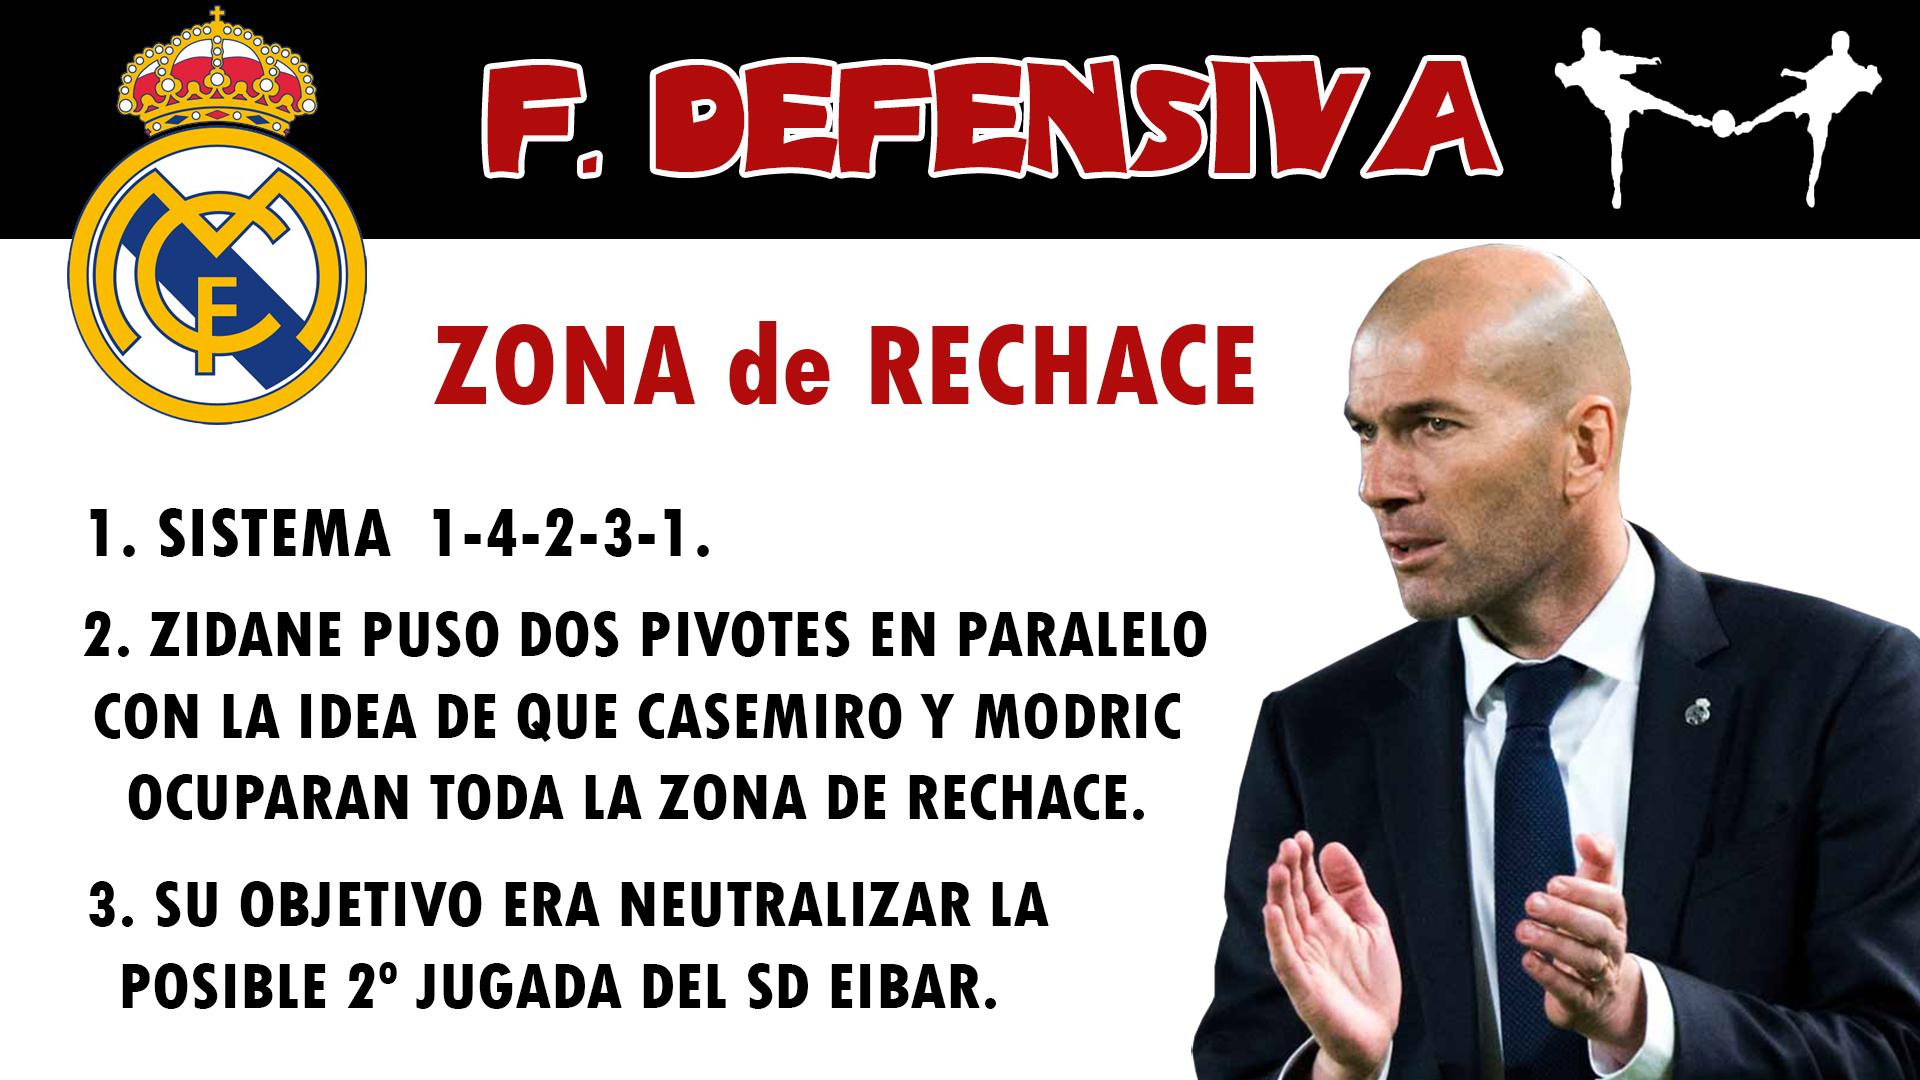 futbolcarrasco zona de rechace real madrid zidane entrenador eibar